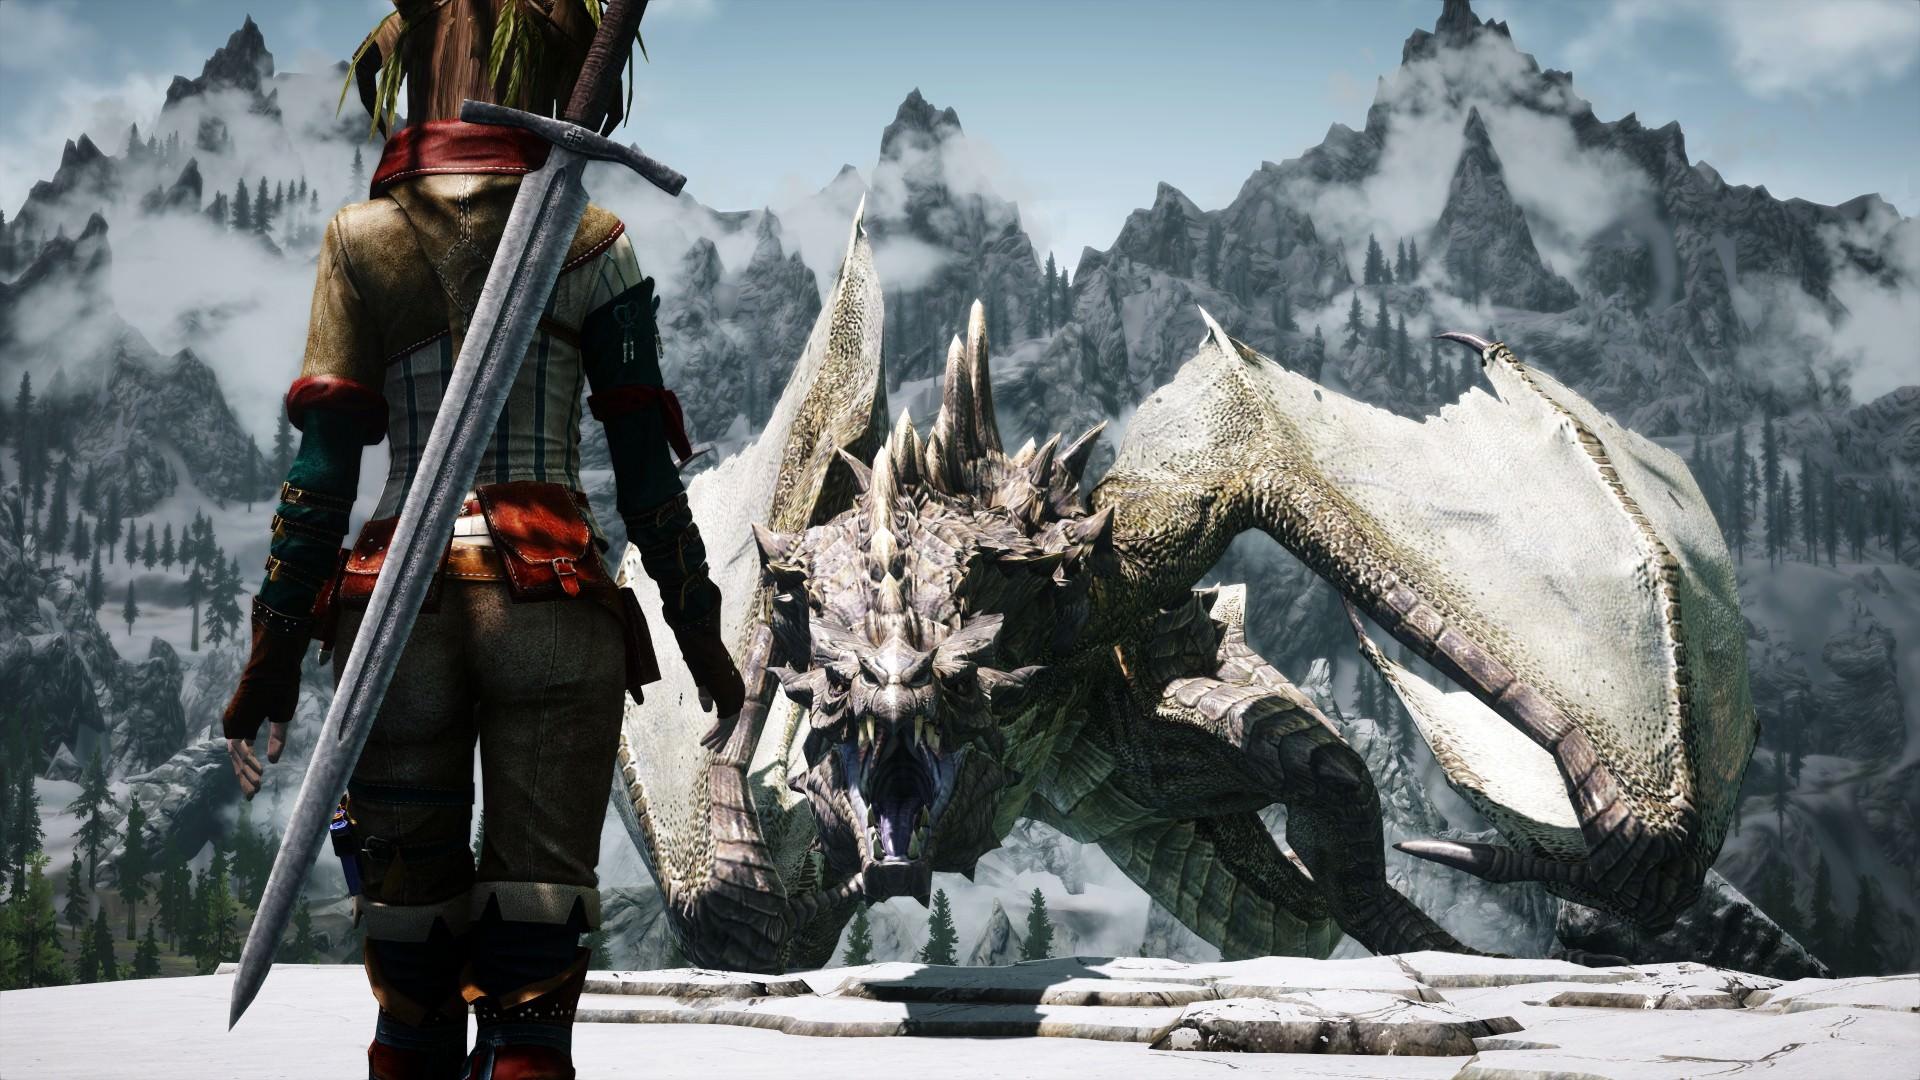 skyrim-warrior-girl-vs-dragon-wallpaper